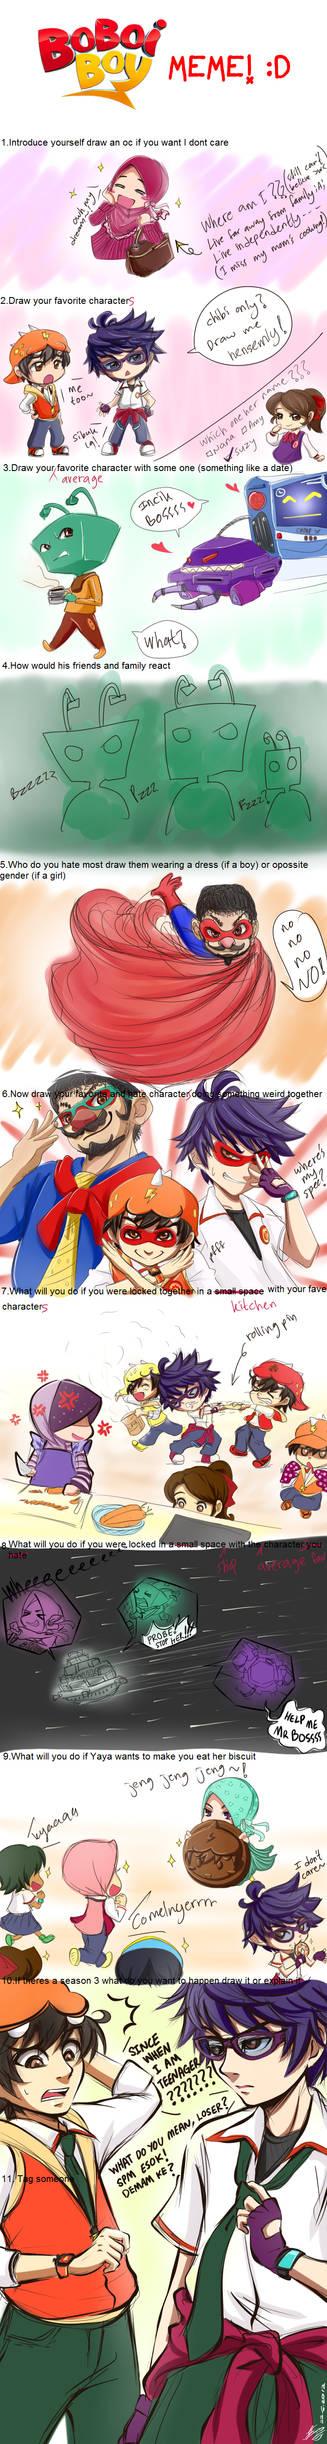 BoBoiBoy Meme 3~! by ryocutema